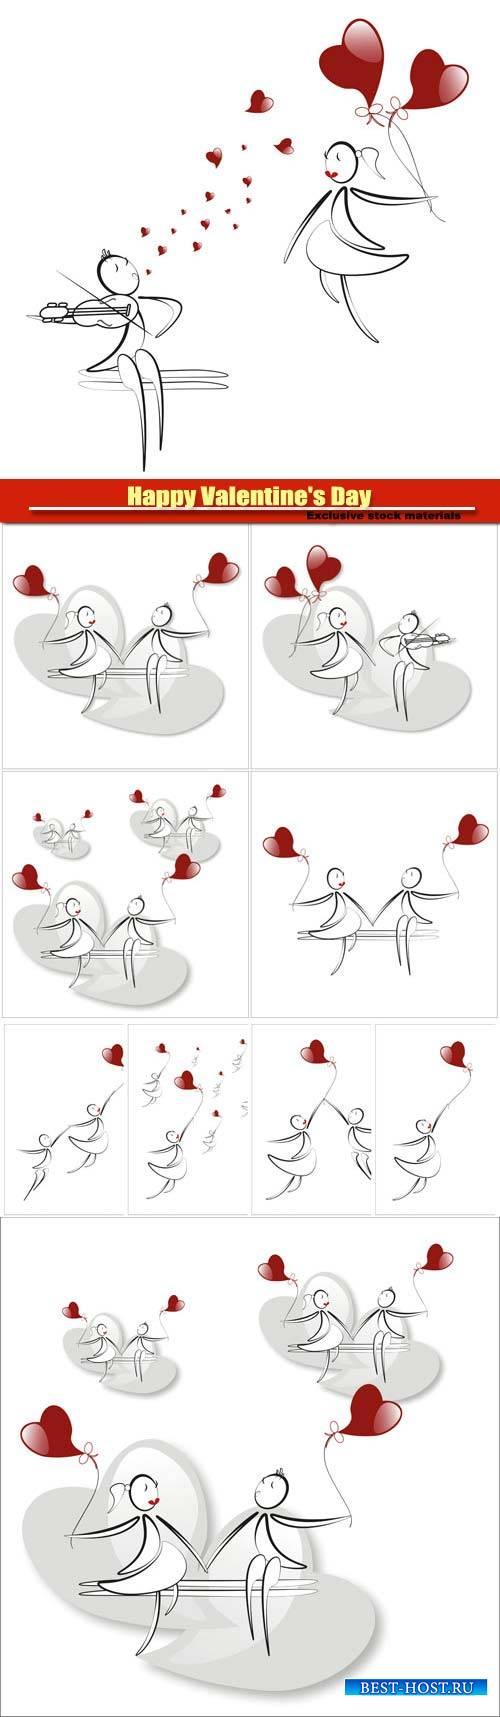 Happy Valentine's Day vector, hearts, romance, love #14